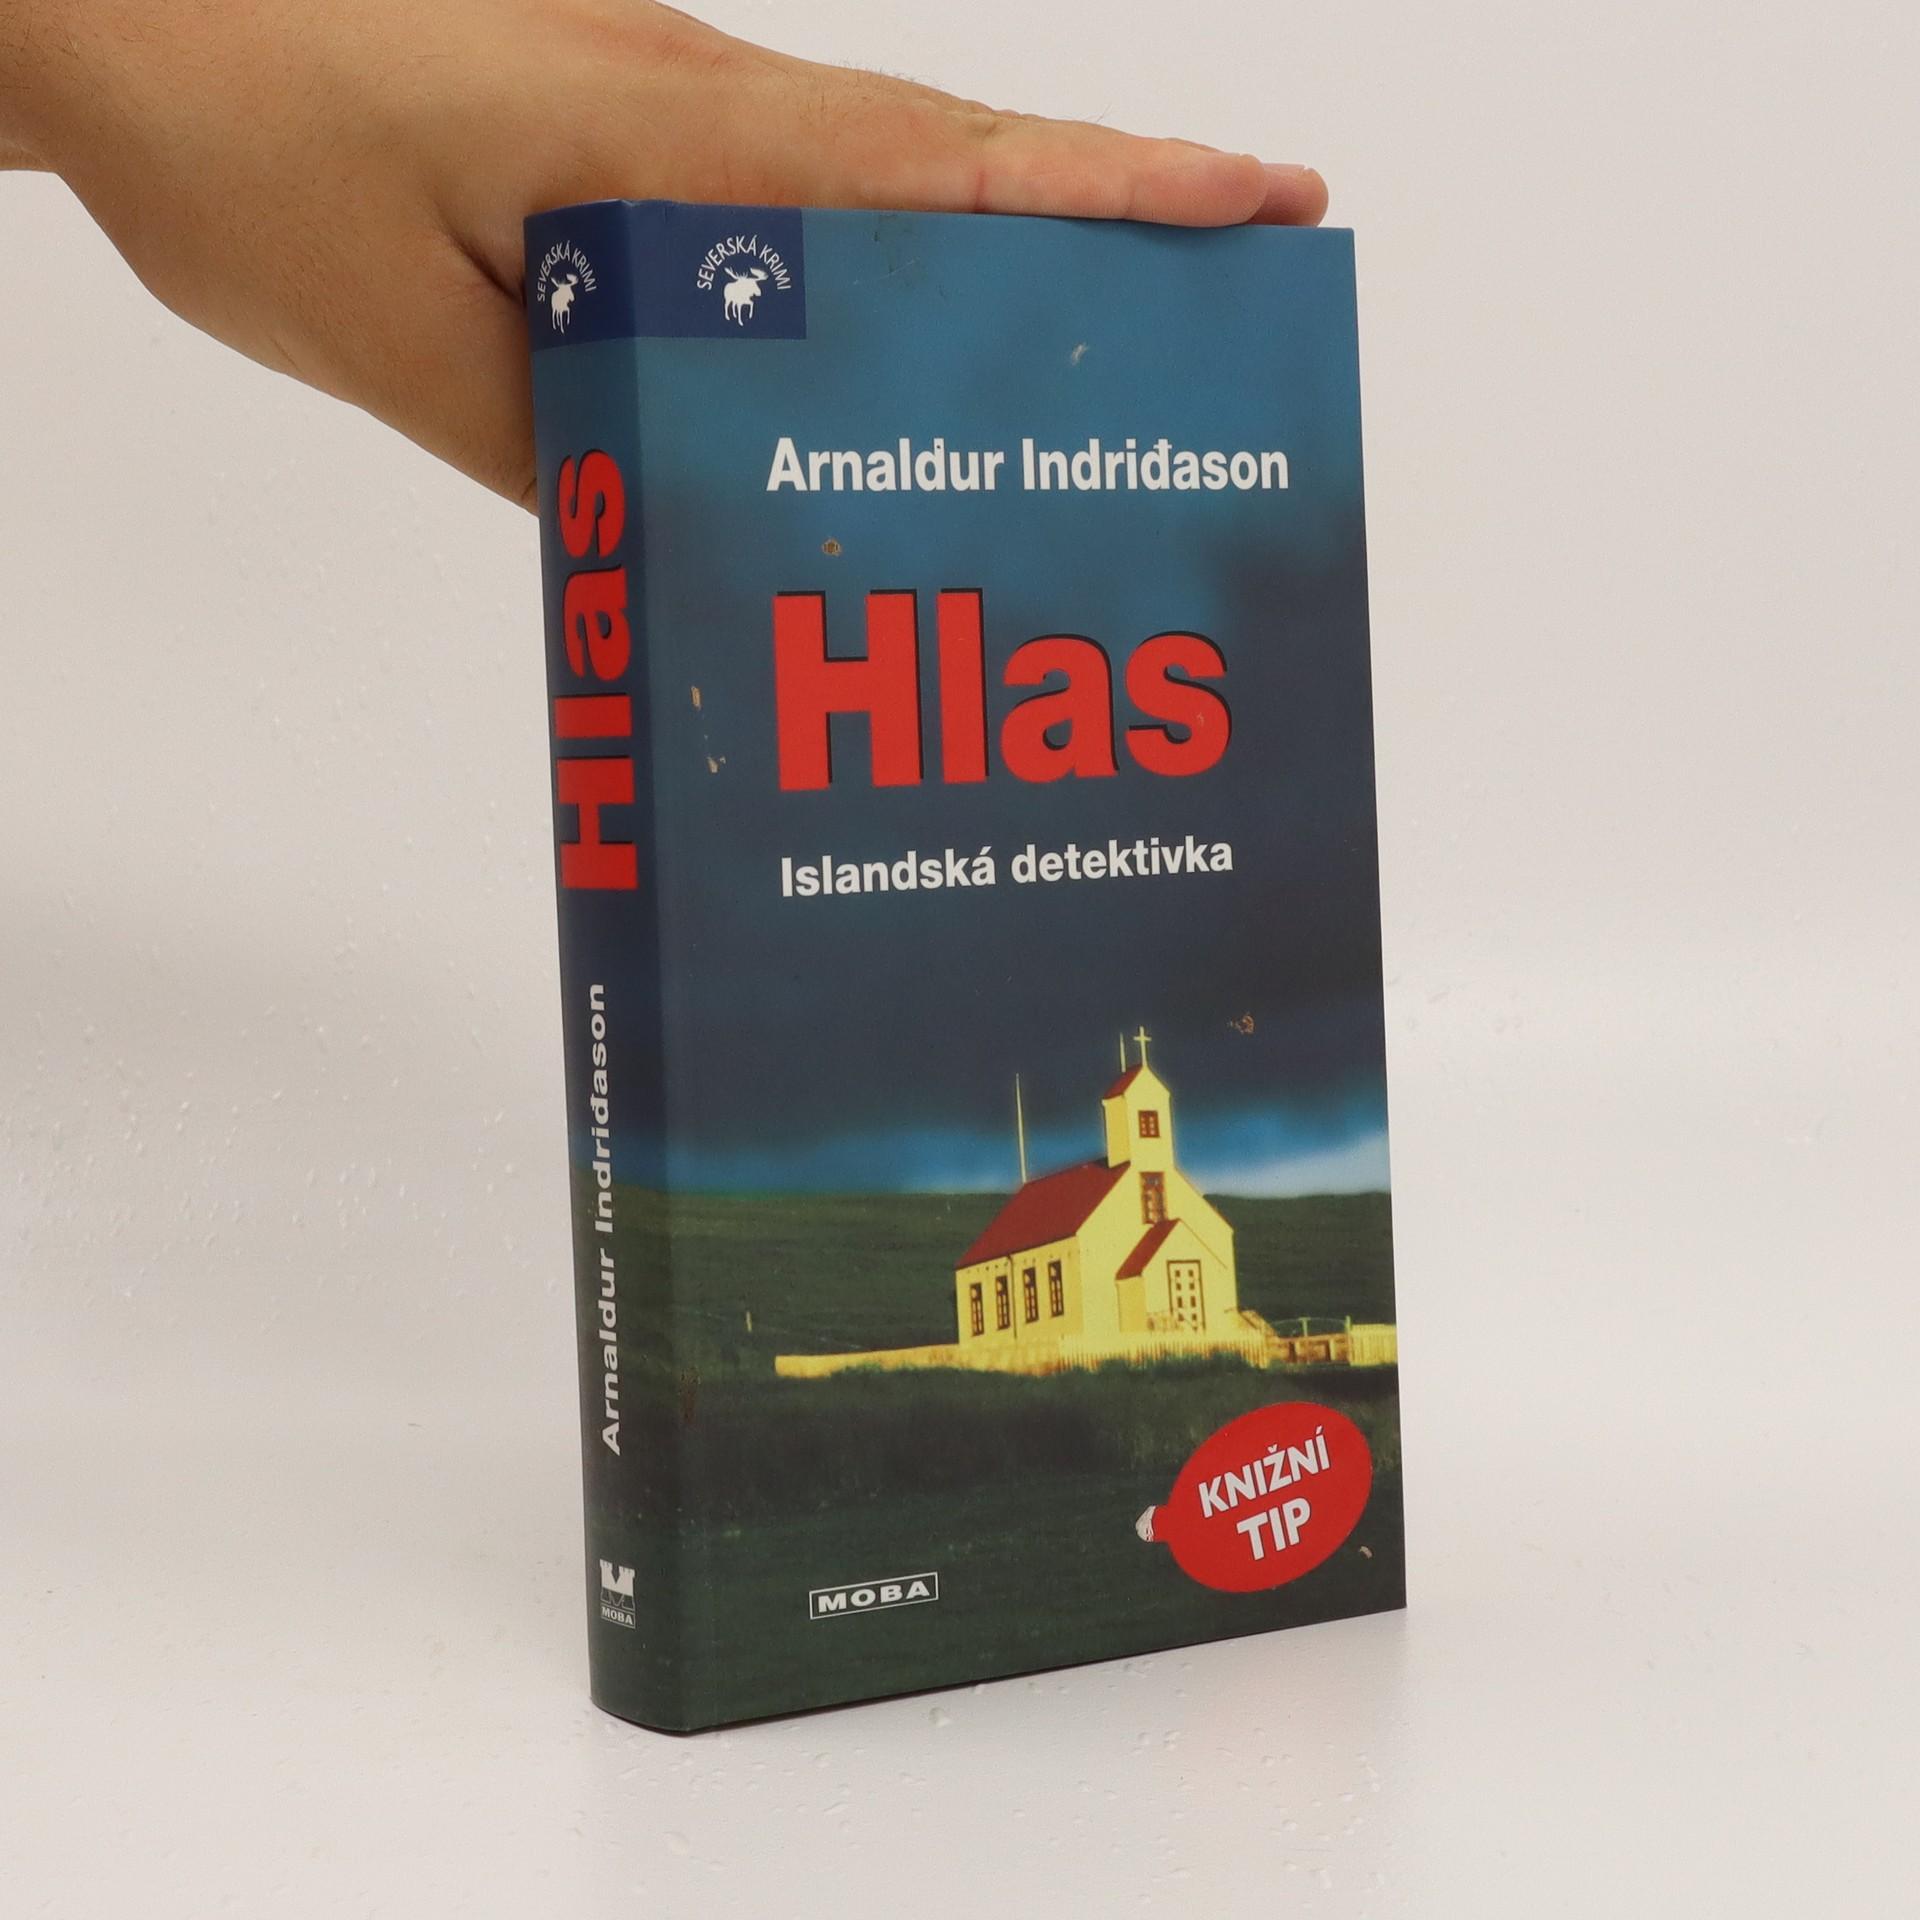 antikvární kniha Hlas : islandská detektivka, neuveden